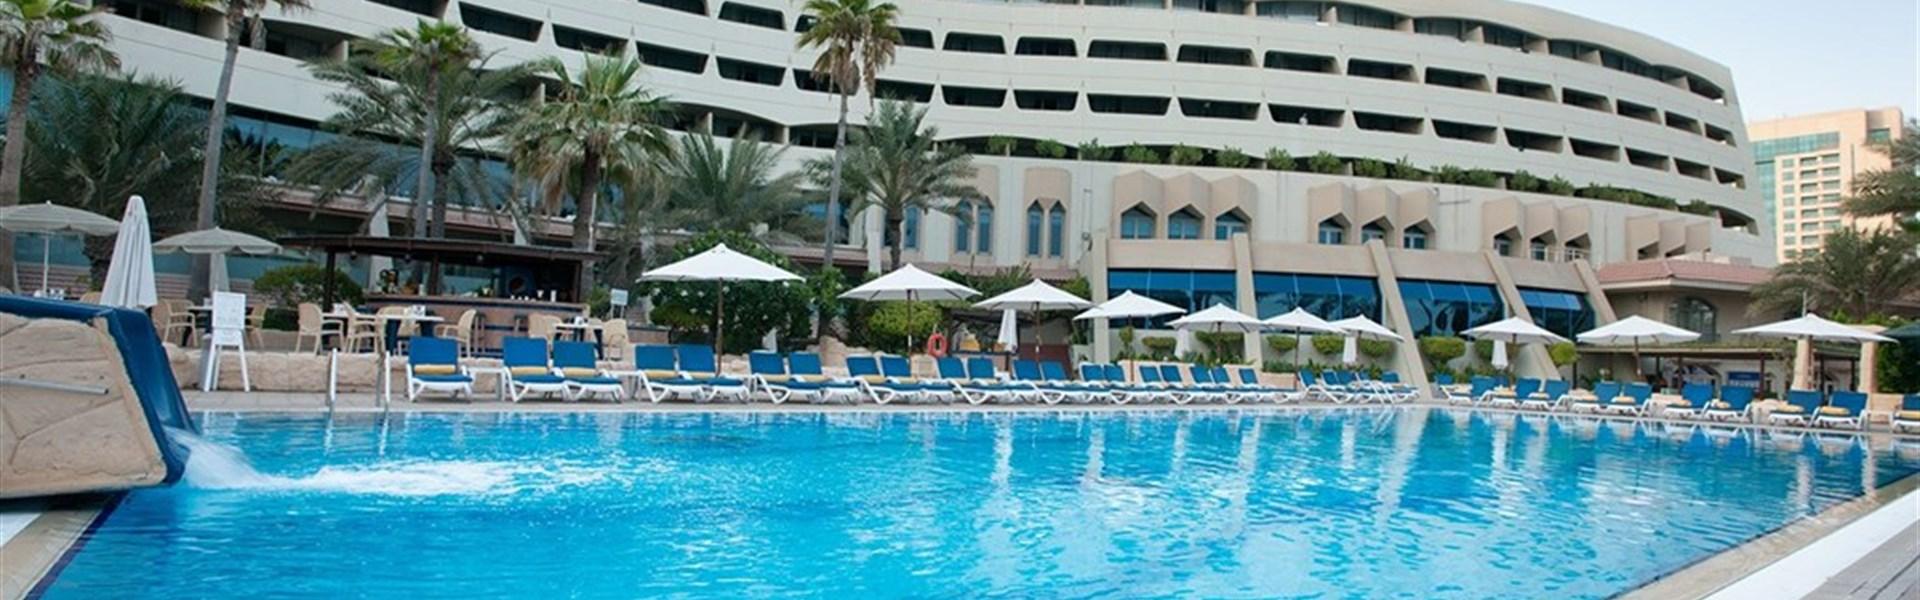 Marco Polo - Occidental Sharjah Grand - pohled na hotel s bazénem